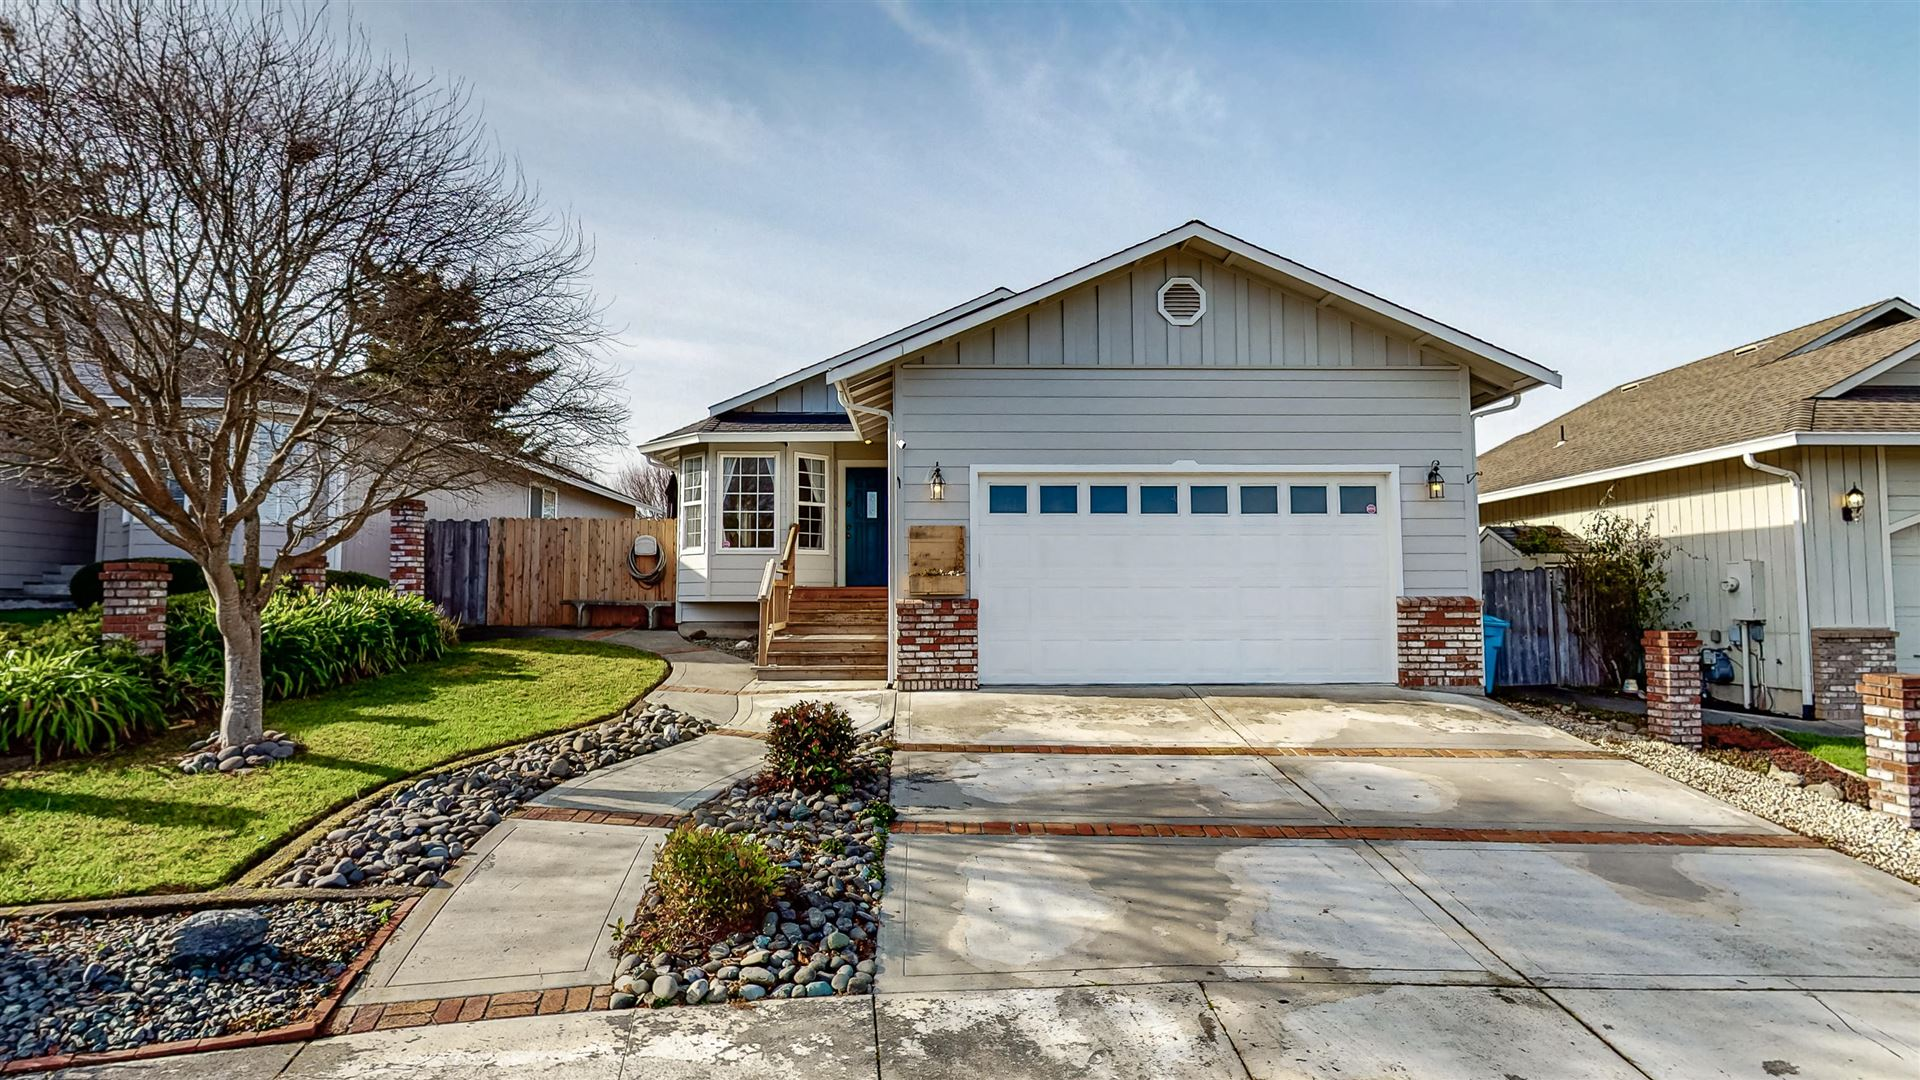 1838 Montecito Way, Eureka, CA 95501 - MLS#: 258105